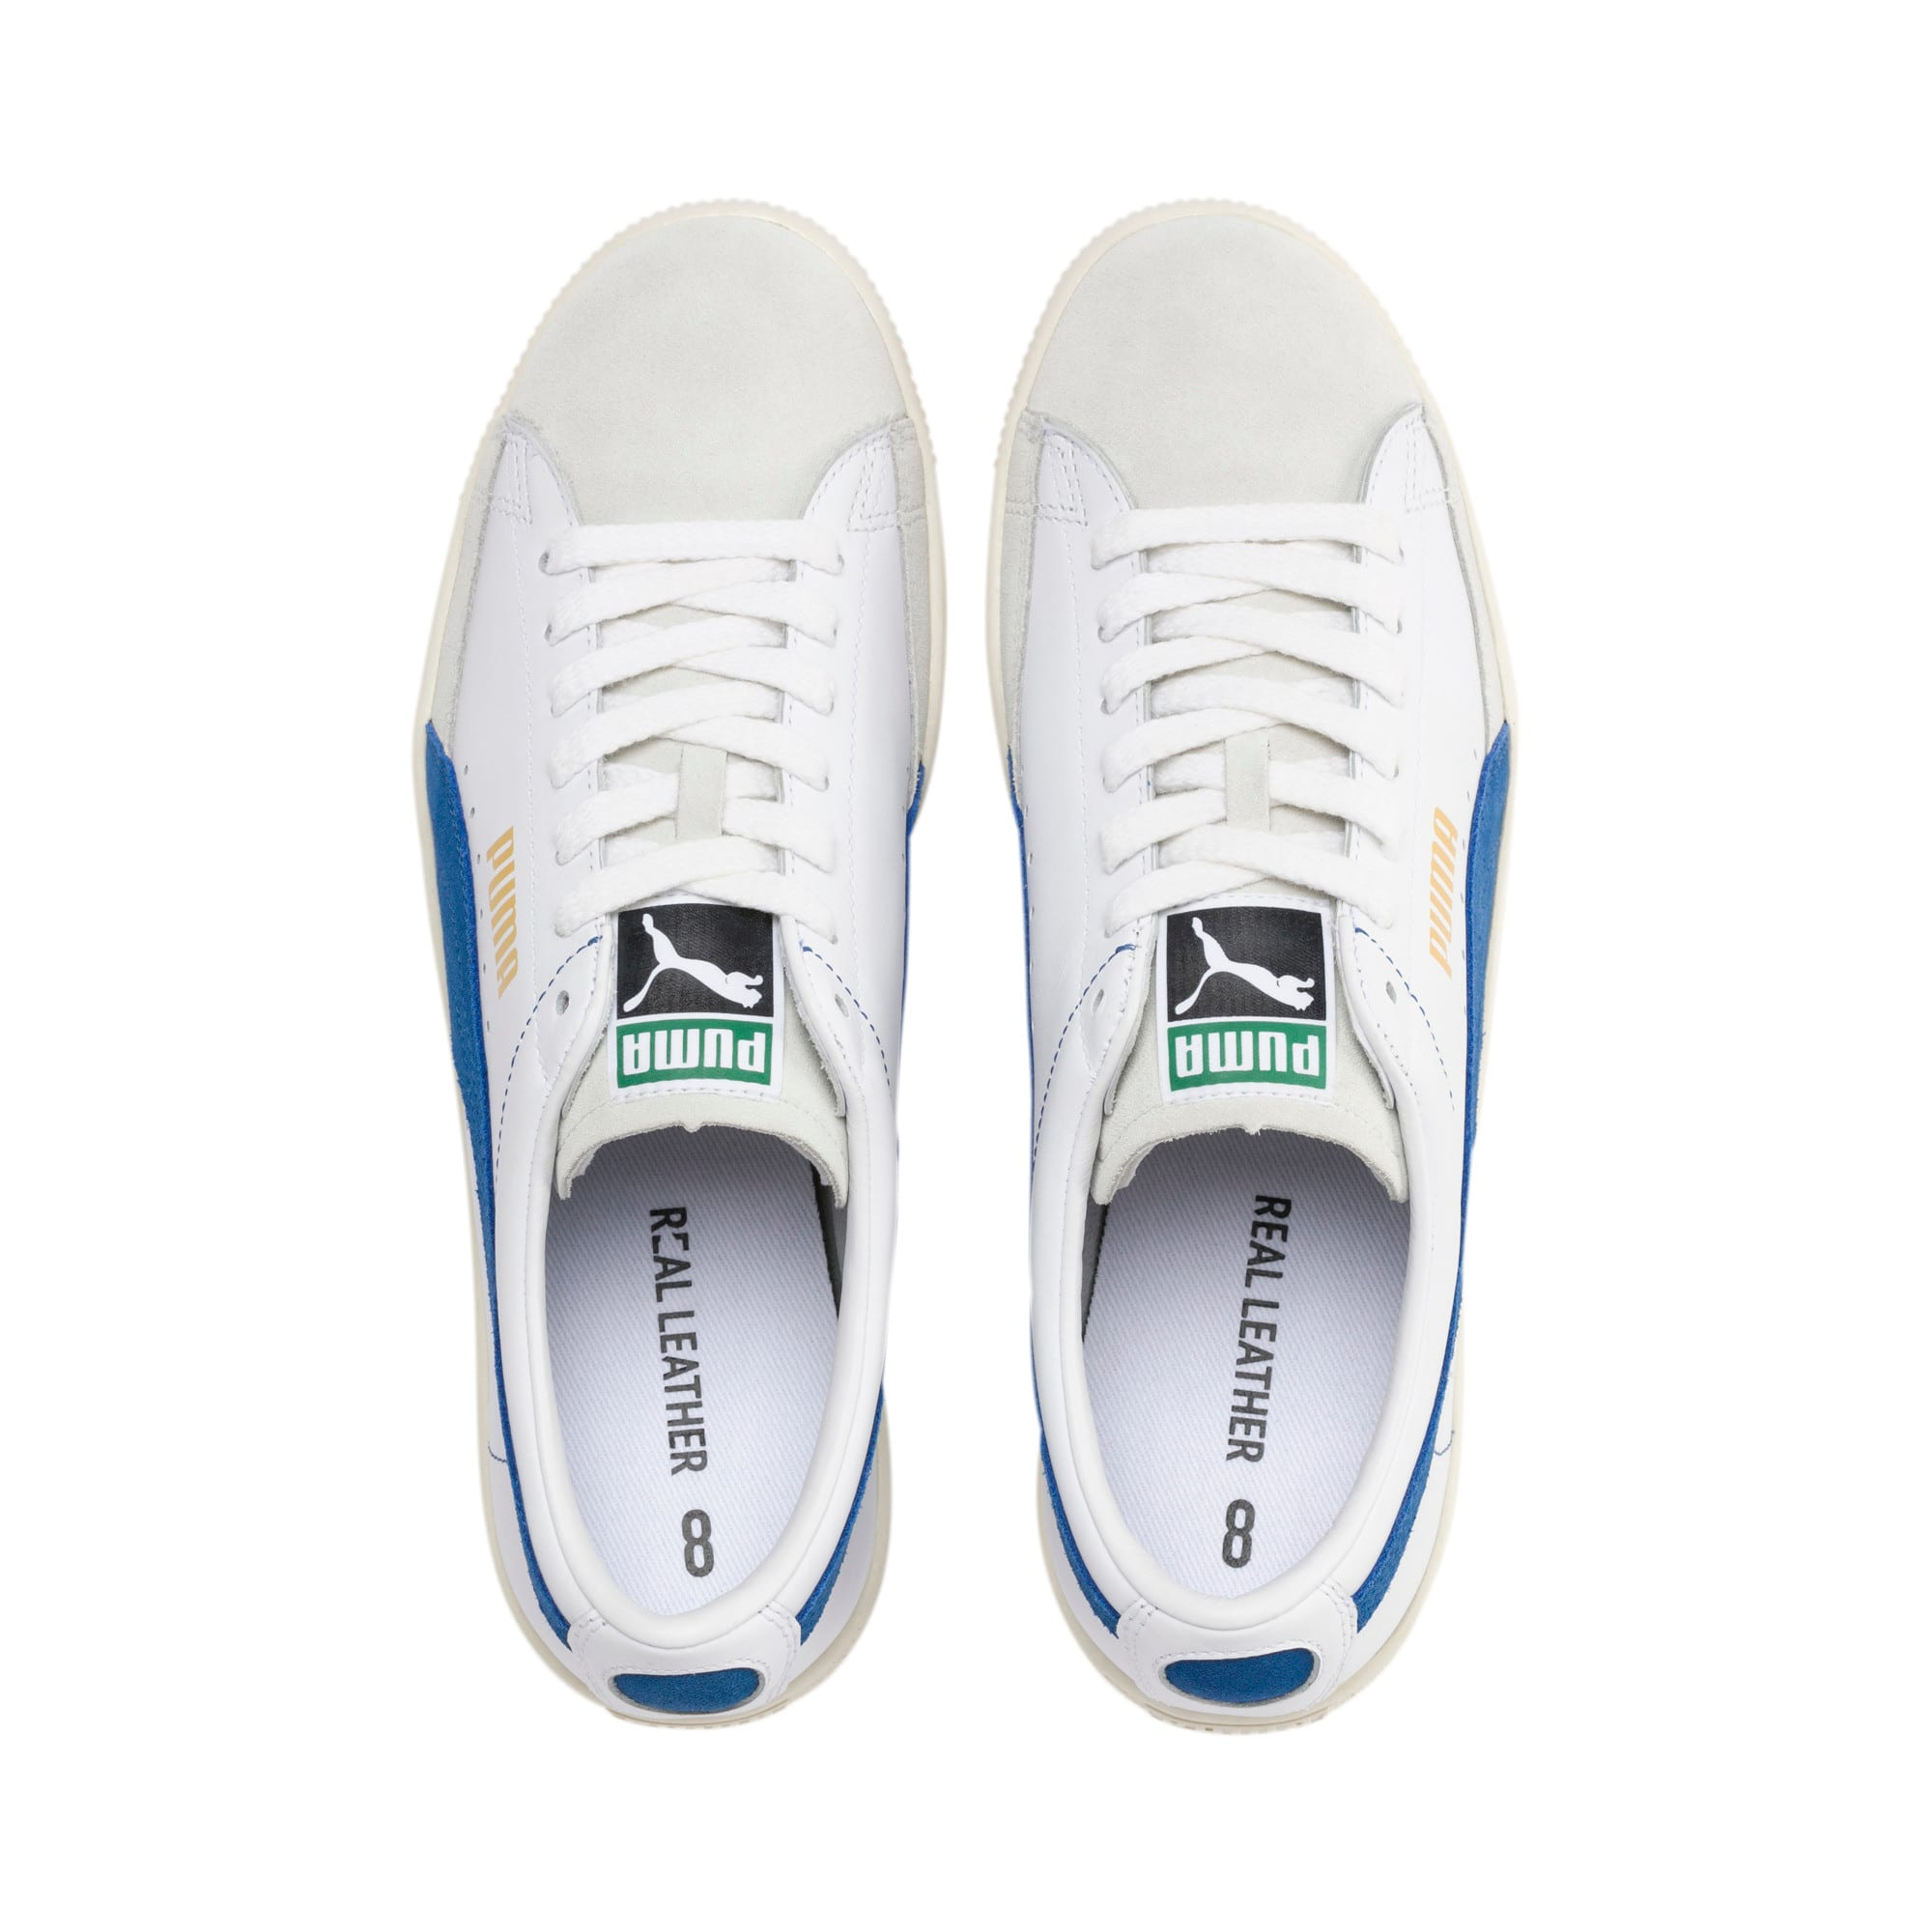 Miniatura 7 de Zapatos deportivosBasket 90680, Puma White-Galaxy Blue-Whisp, mediano